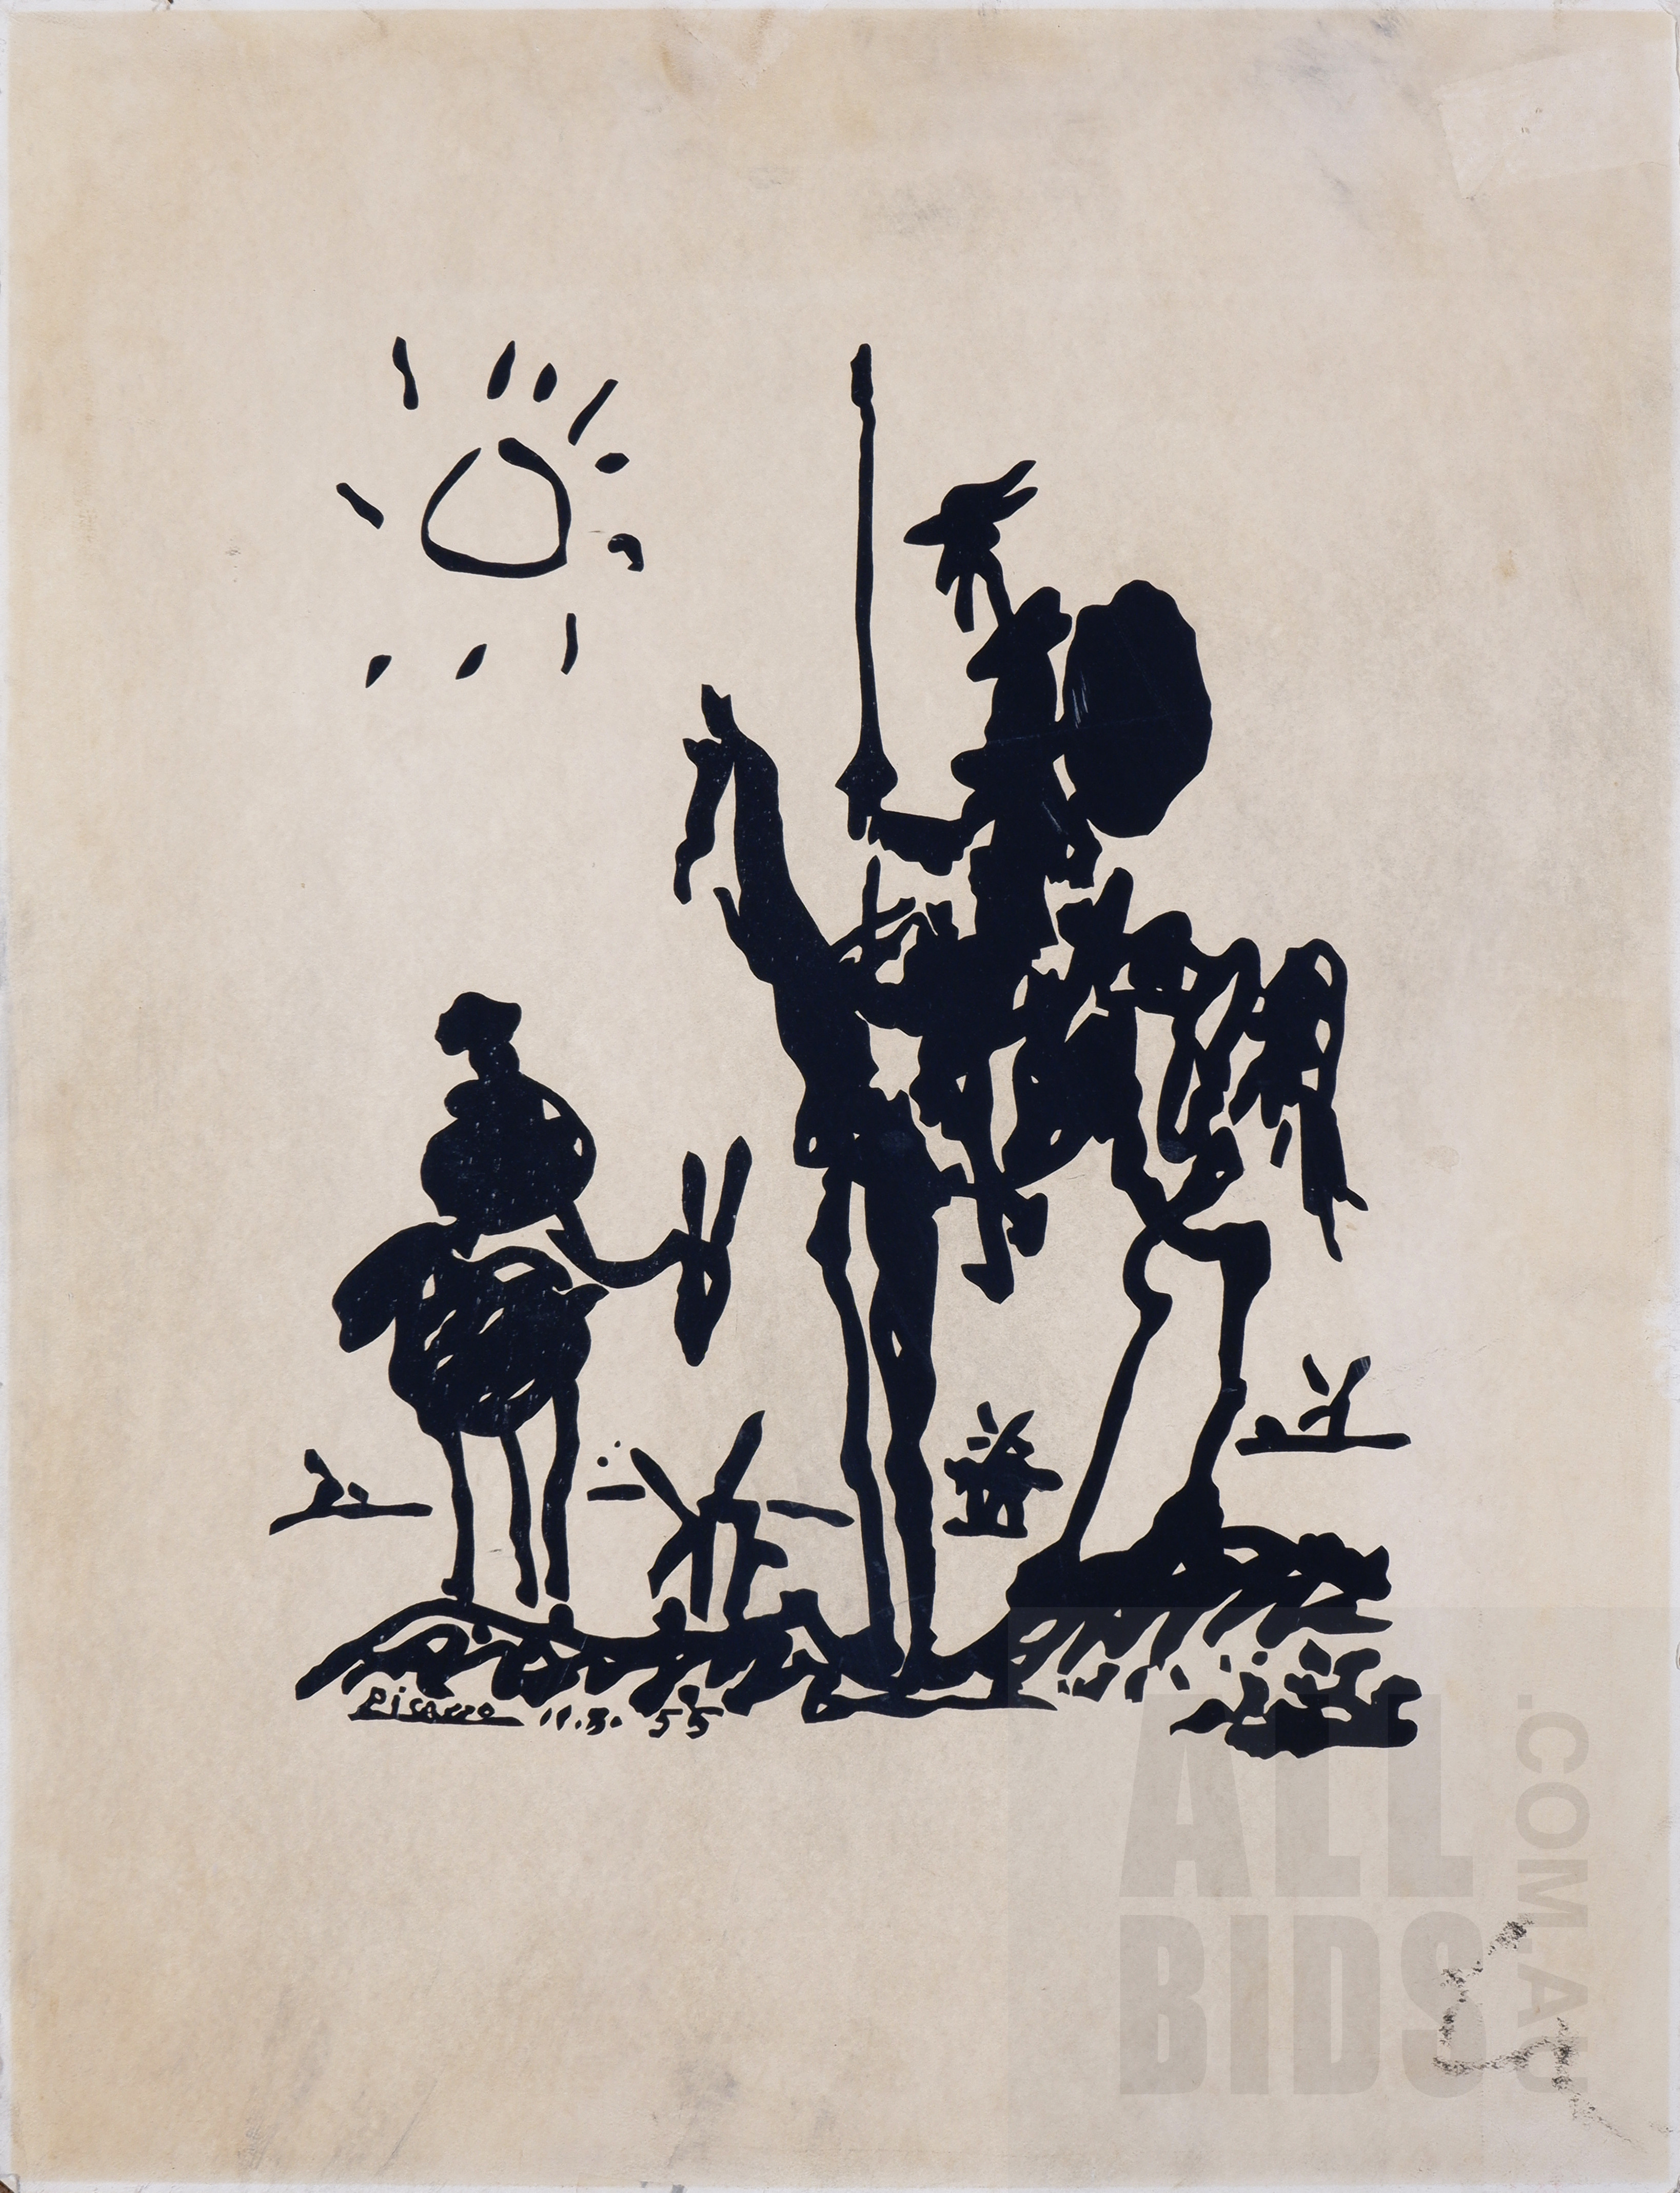 'Pablo Picasso (1881-1973, Spanish), Don Quixote 1955, Lithograph, 66 x 50 cm (sheet size)'